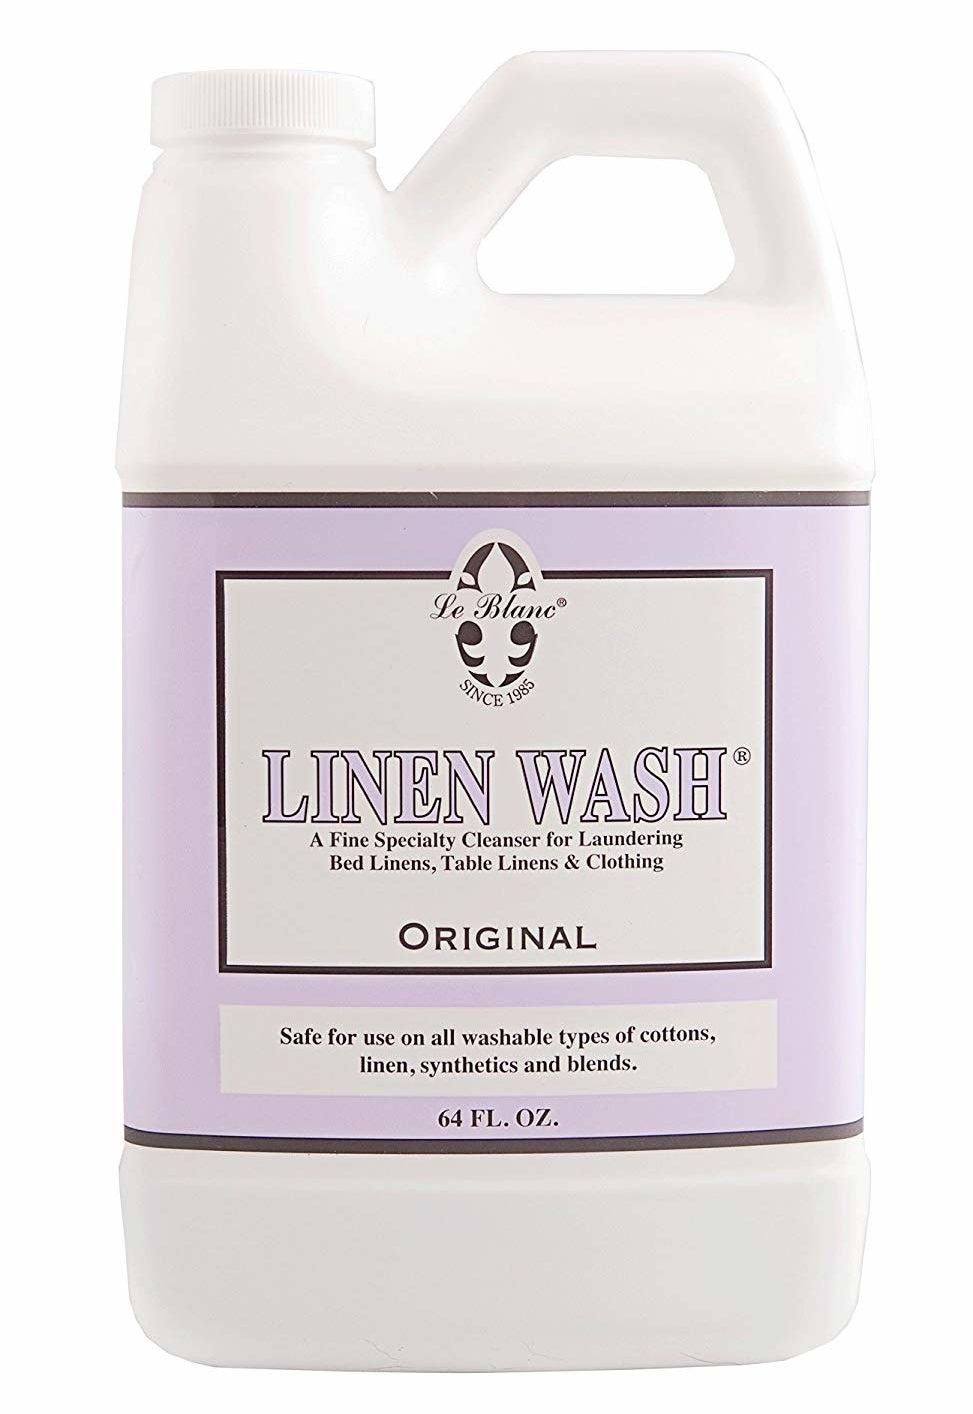 The bottle of Linen Wash in original